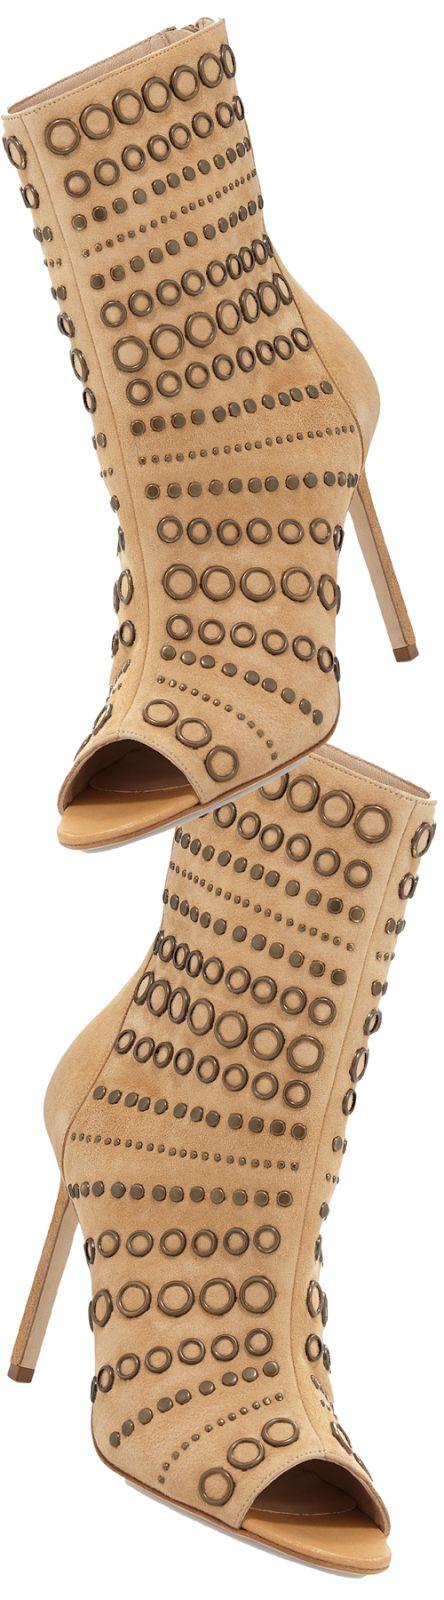 Manolo Blahnik Baskegrod Open-Toe Grommet Suede Ankle Boot, Camel - LOOKandLOVEwithLOLO